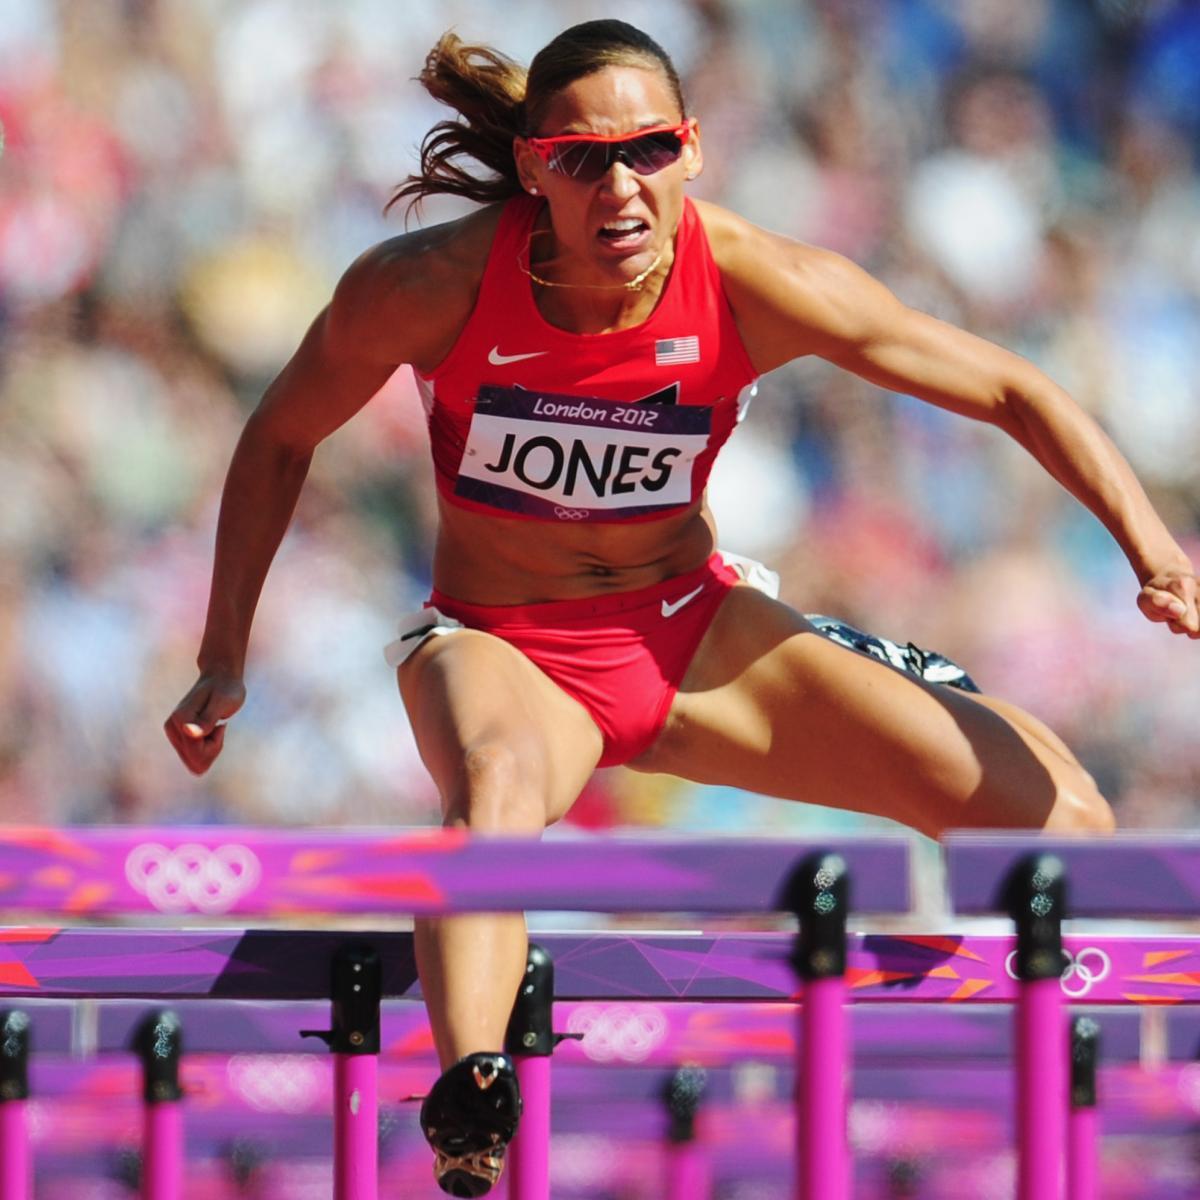 olympic hurdler jones crossword - HD2978×1986